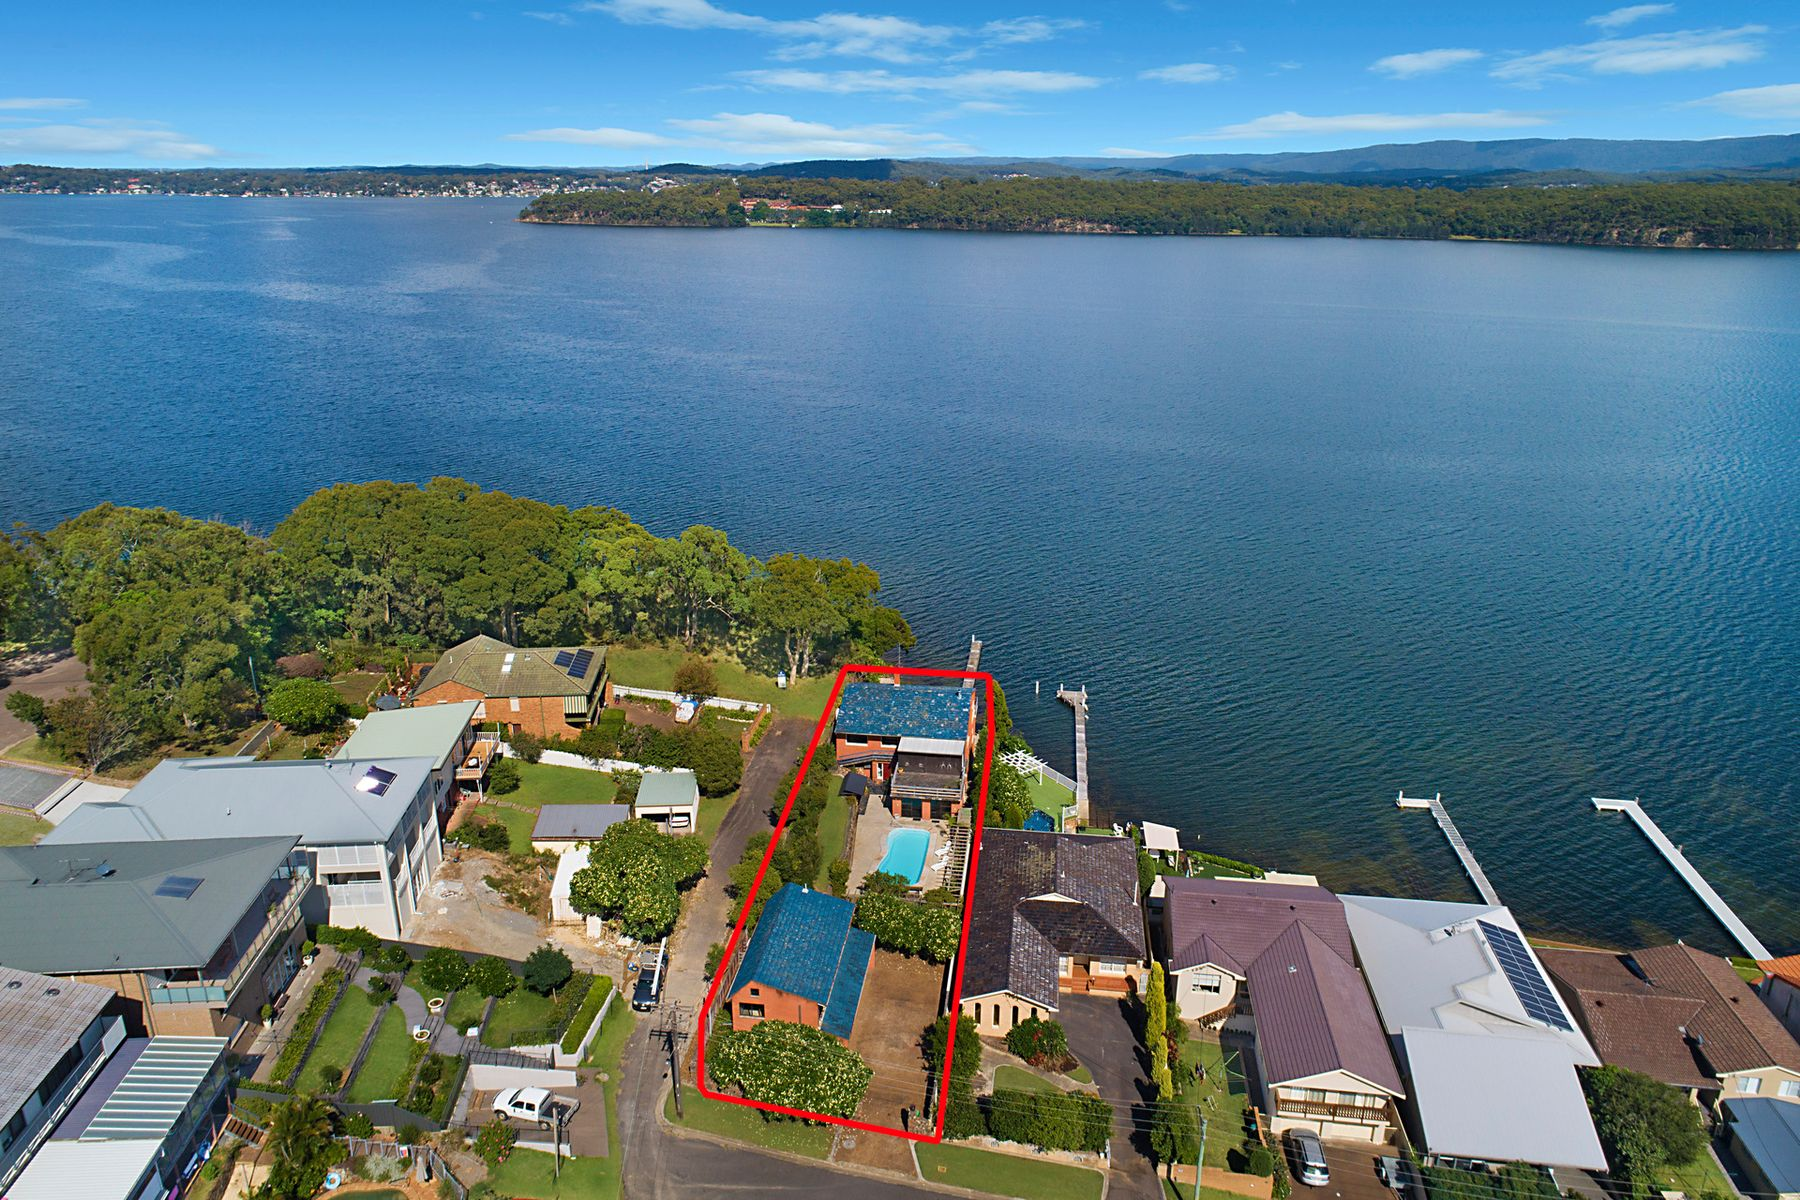 24 Eleebana Rd, Eleebana NSW 2282, Australia, House for Sale